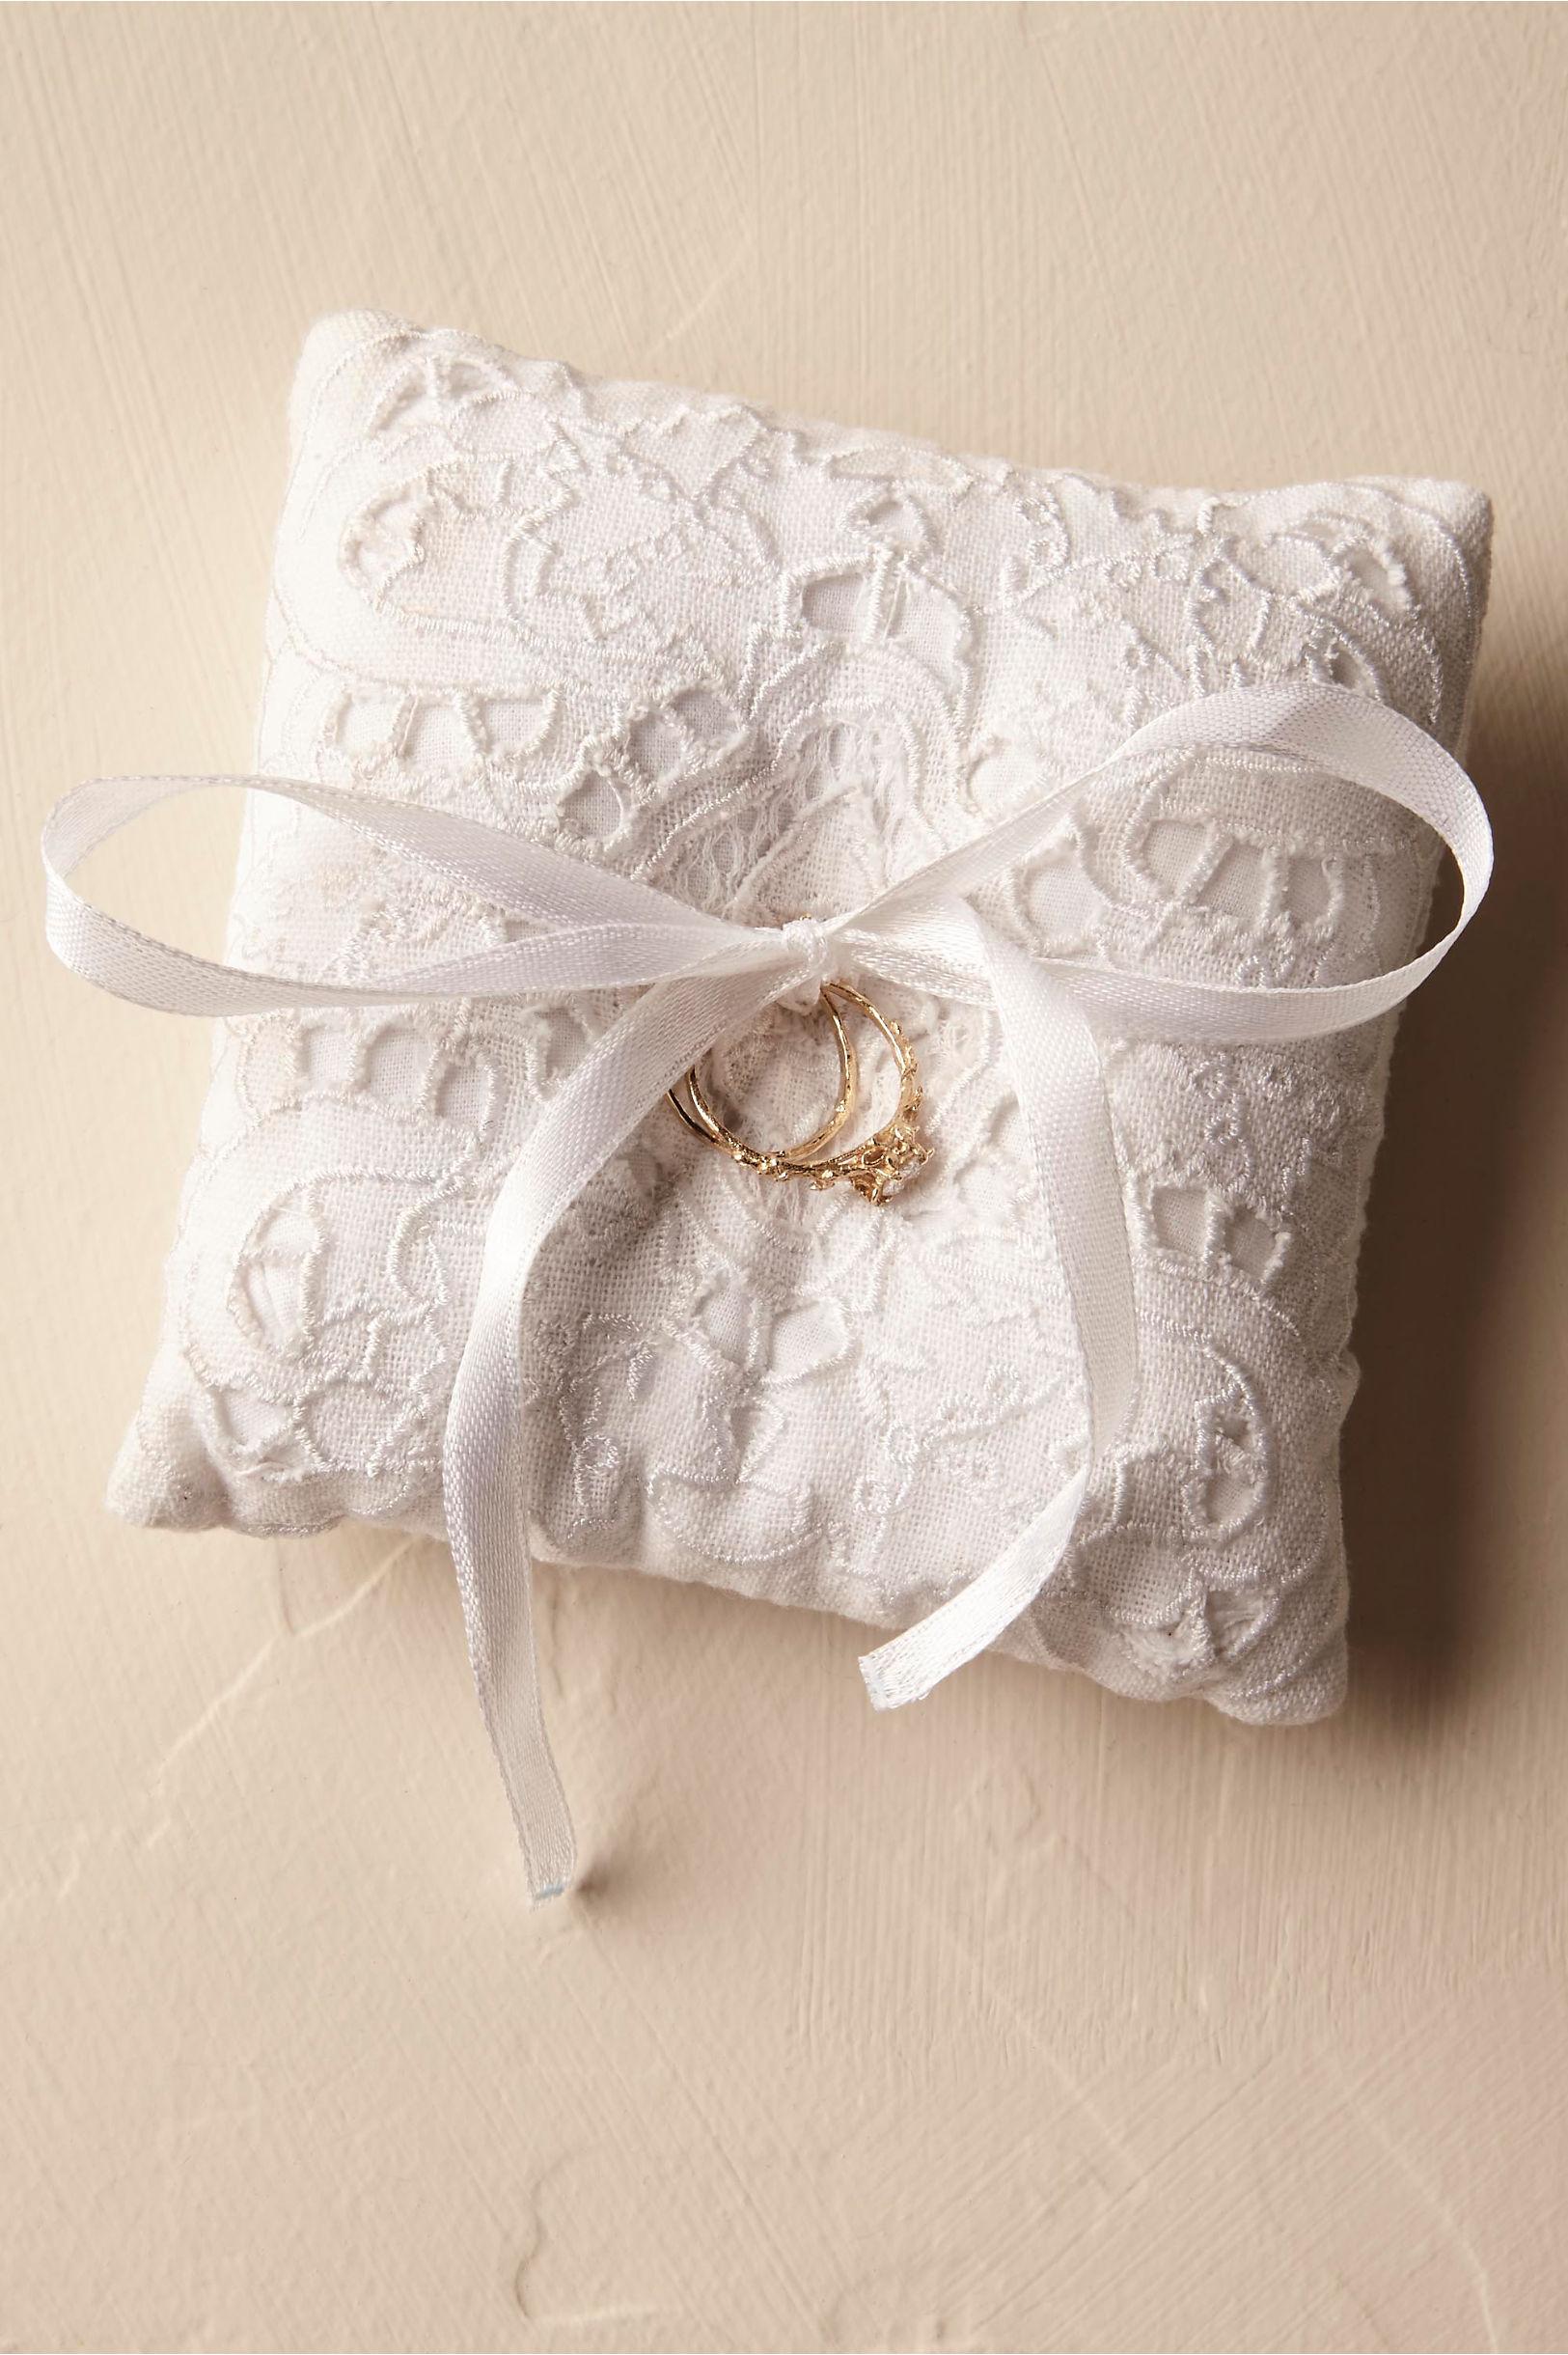 White Eyelet Ring Pillow in Décor